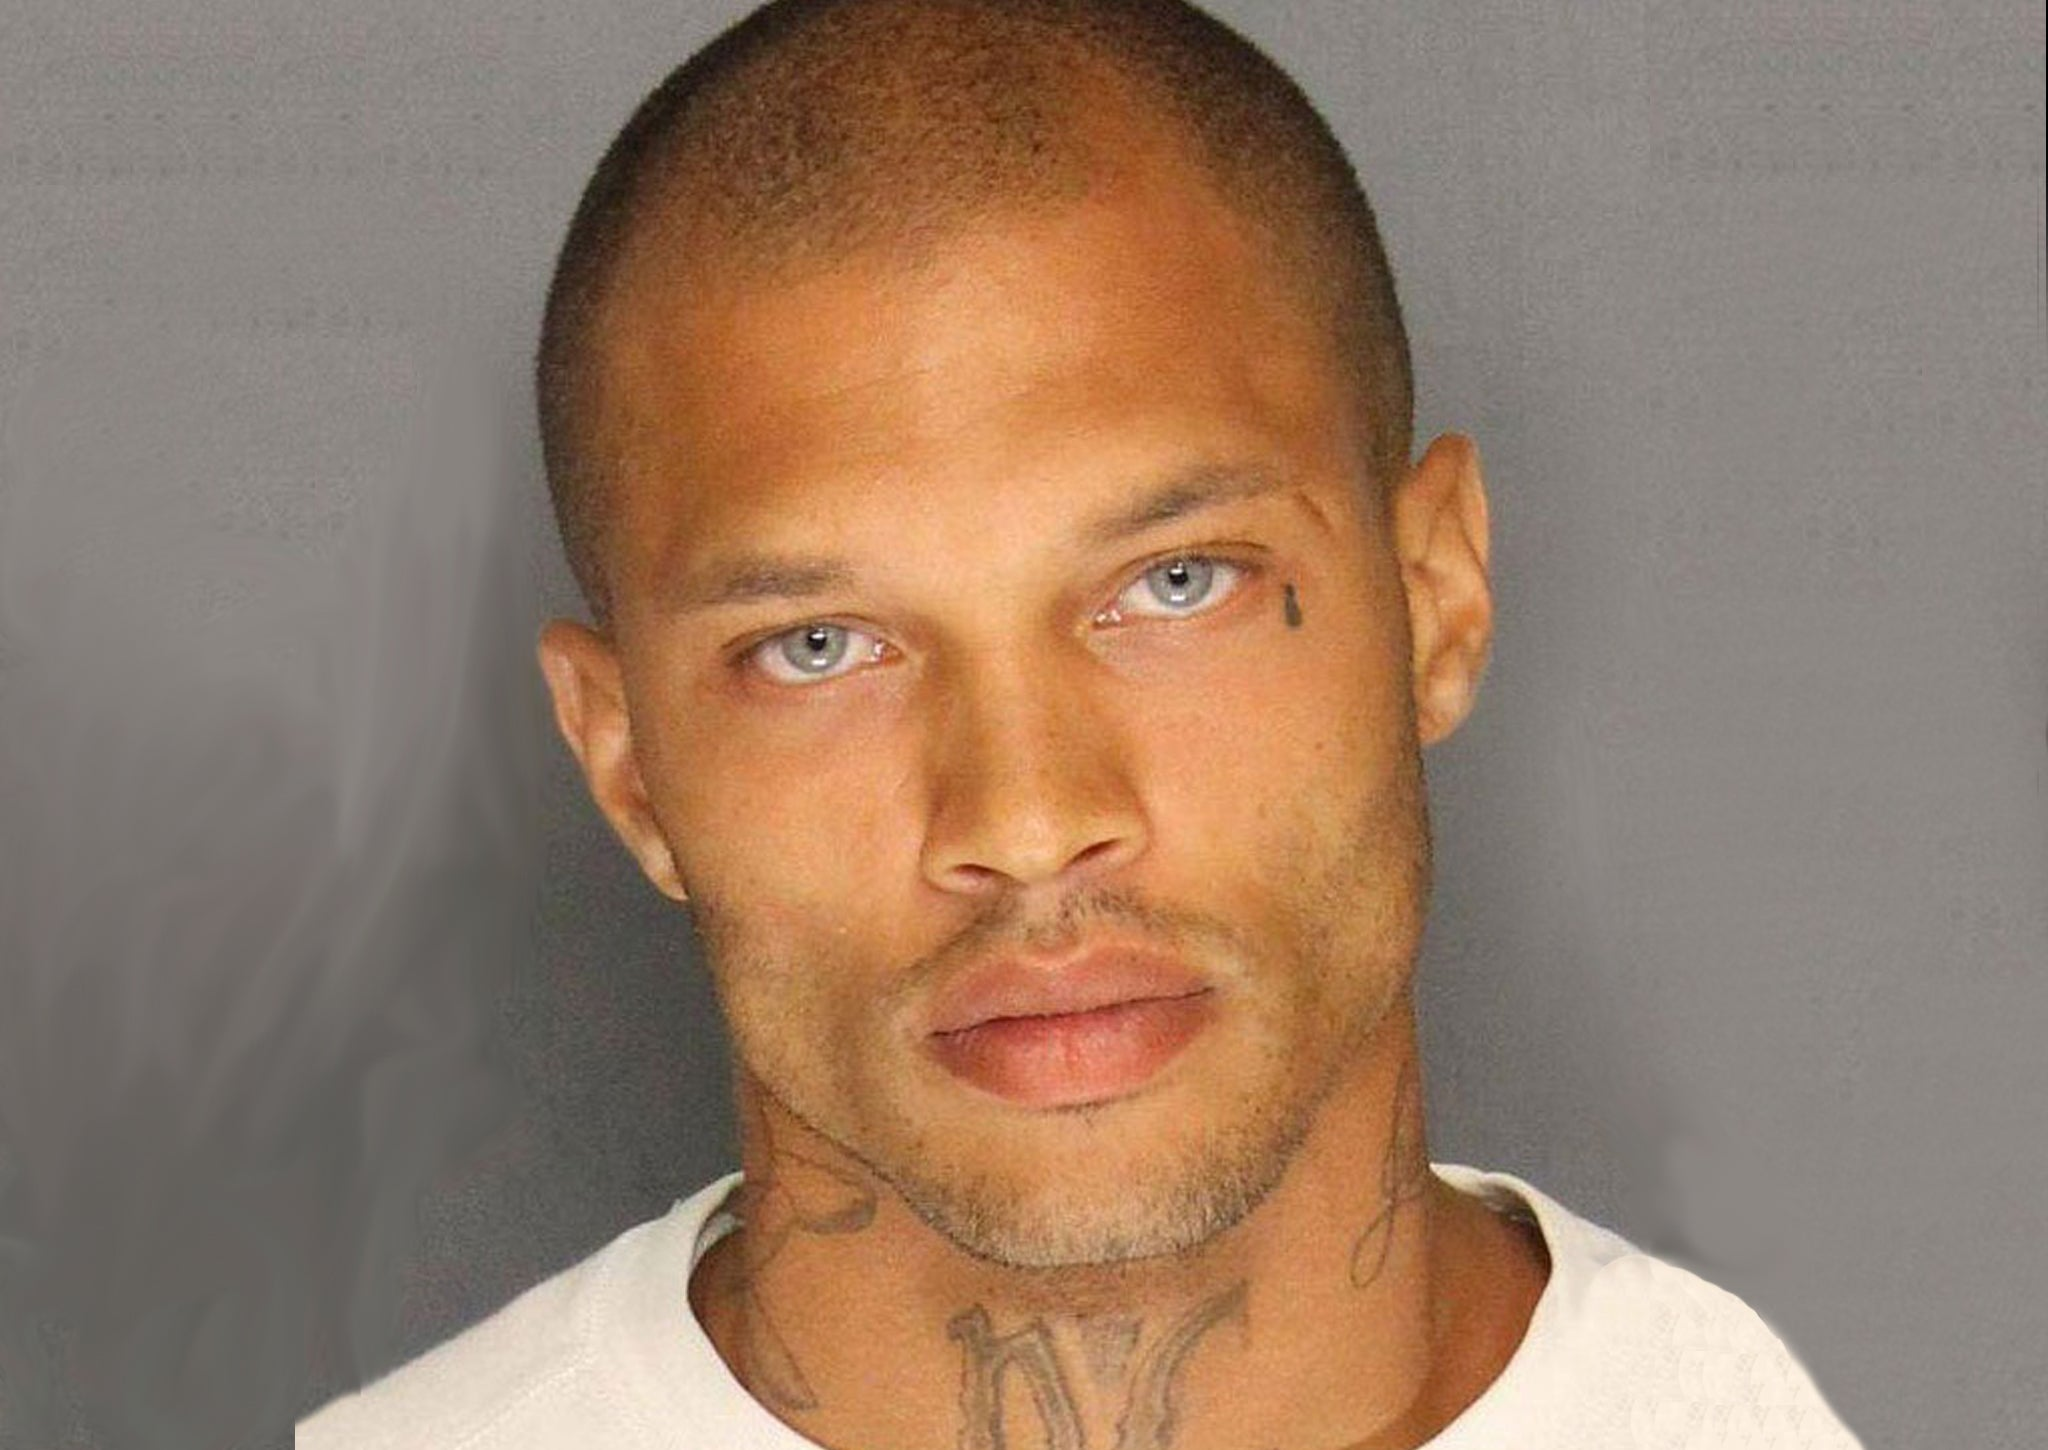 boy love sex arrest convict trial